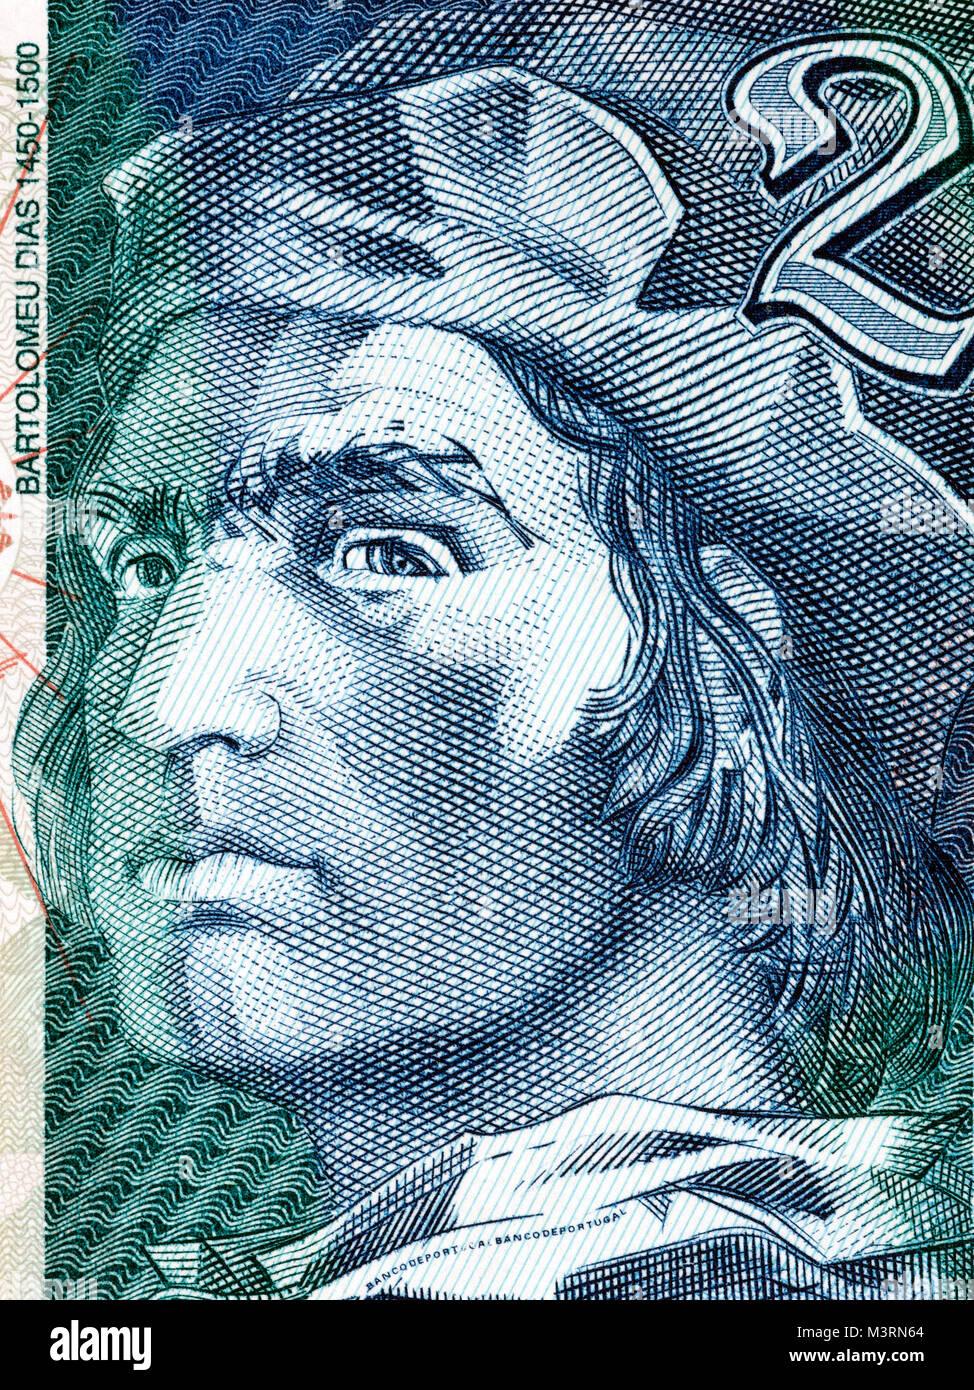 Bartolomeu Dias portrait from Portuguese money - Stock Image